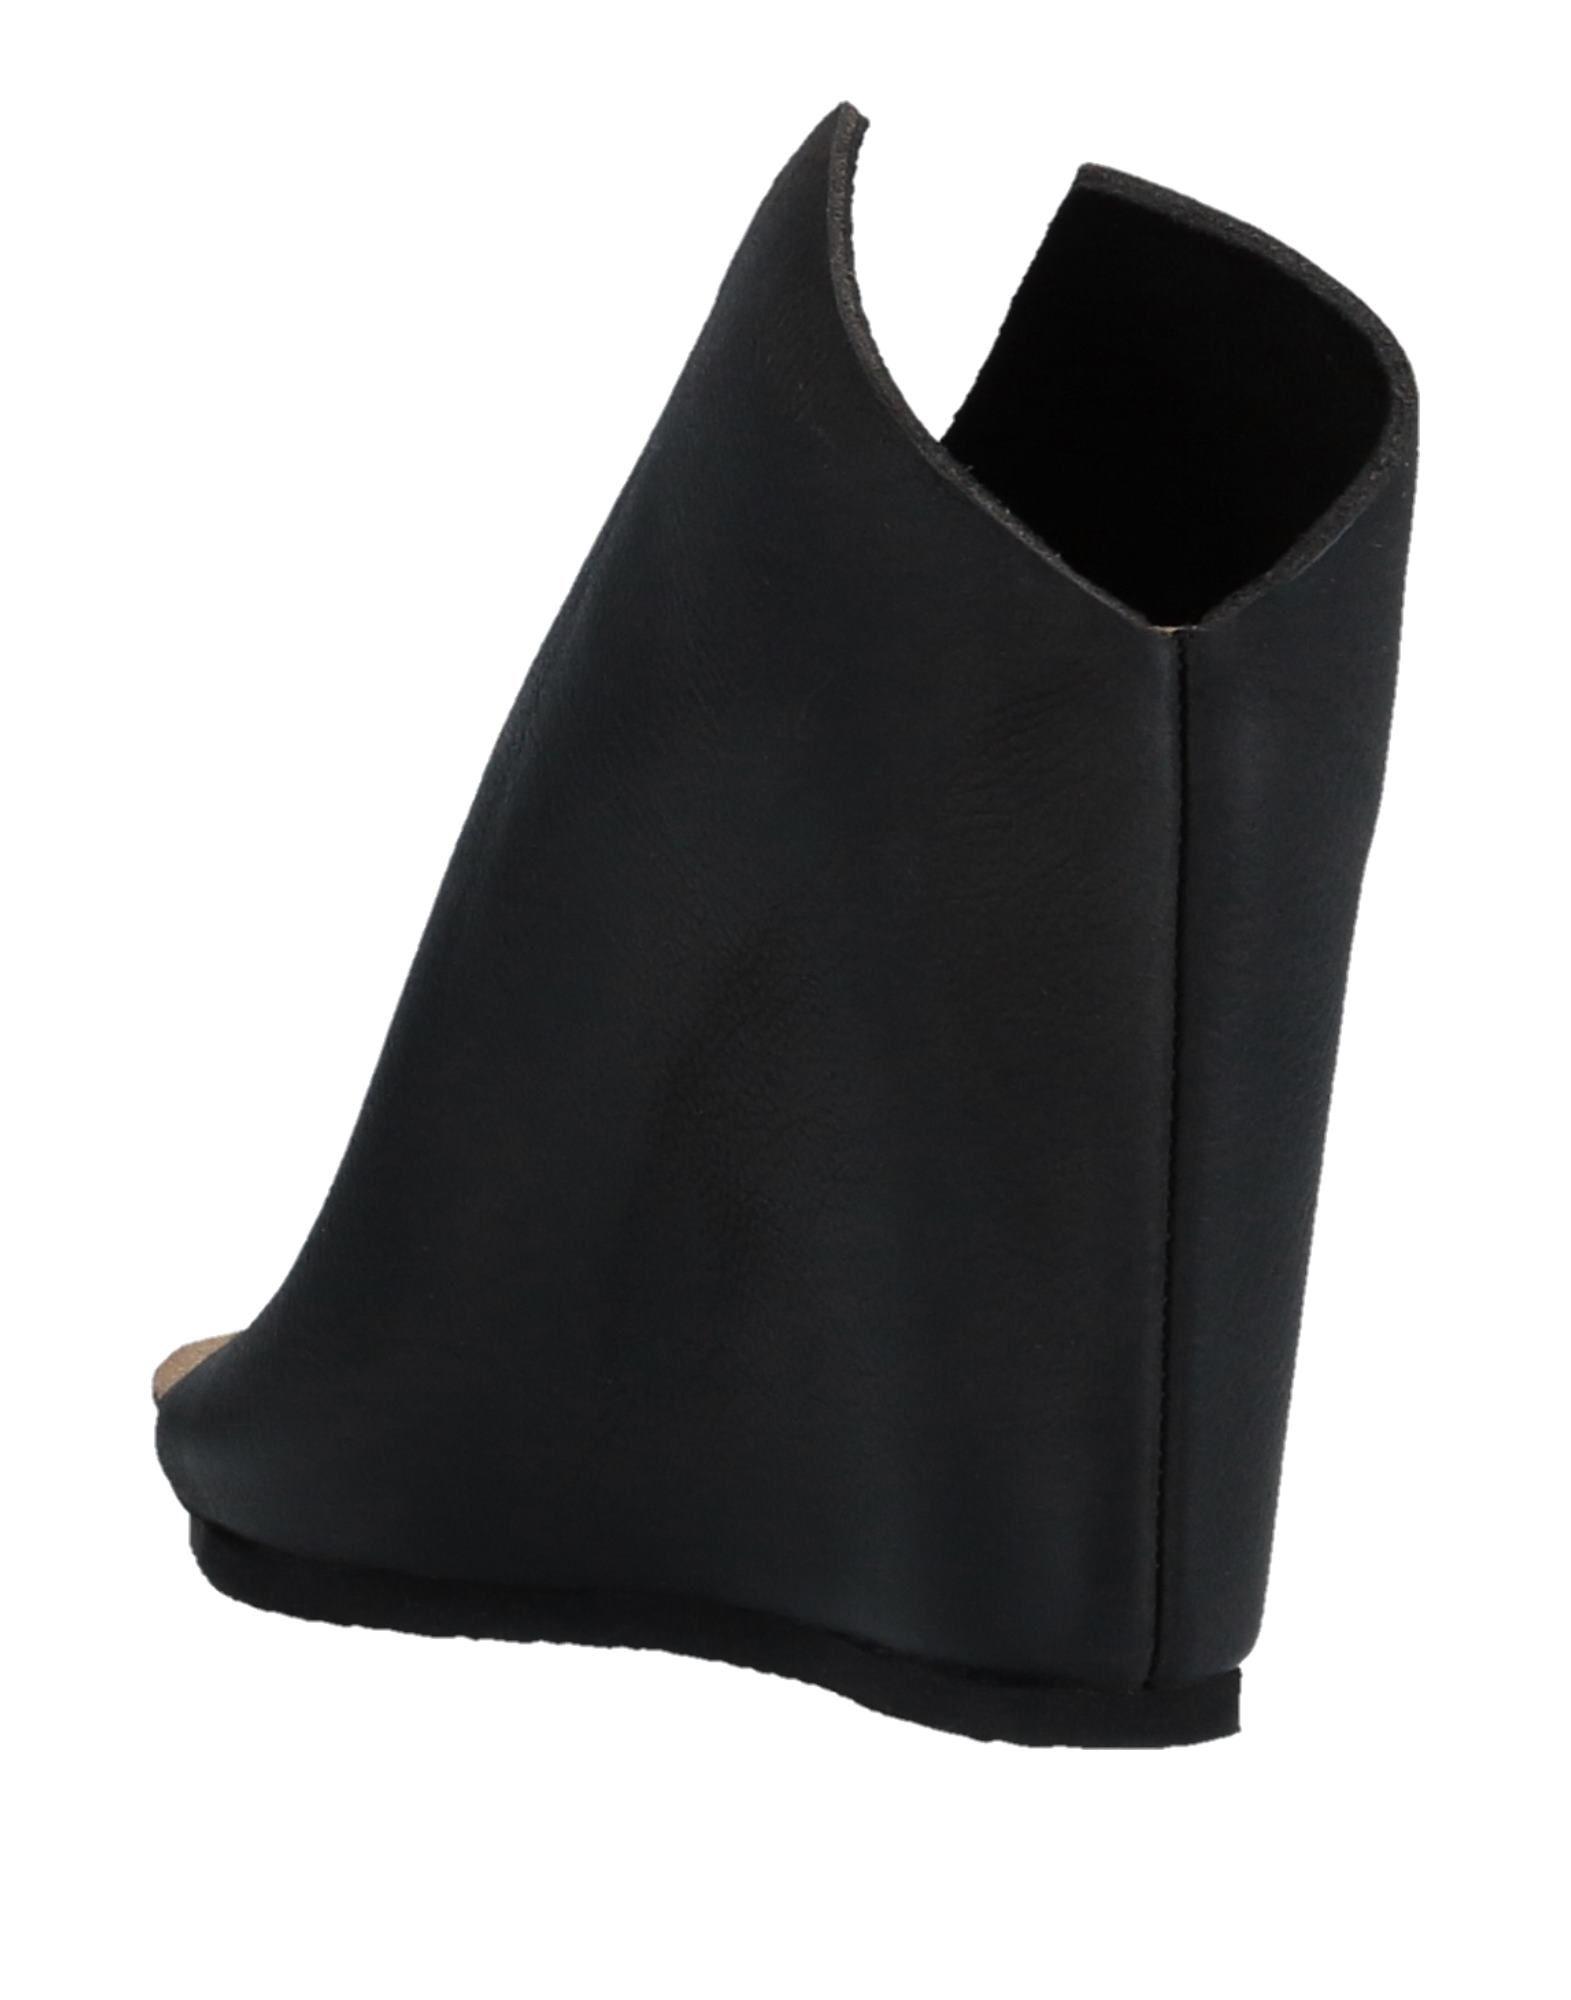 Stilvolle Sandalen billige Schuhe Peter Non Sandalen Stilvolle Damen  11509103KC bfbc83